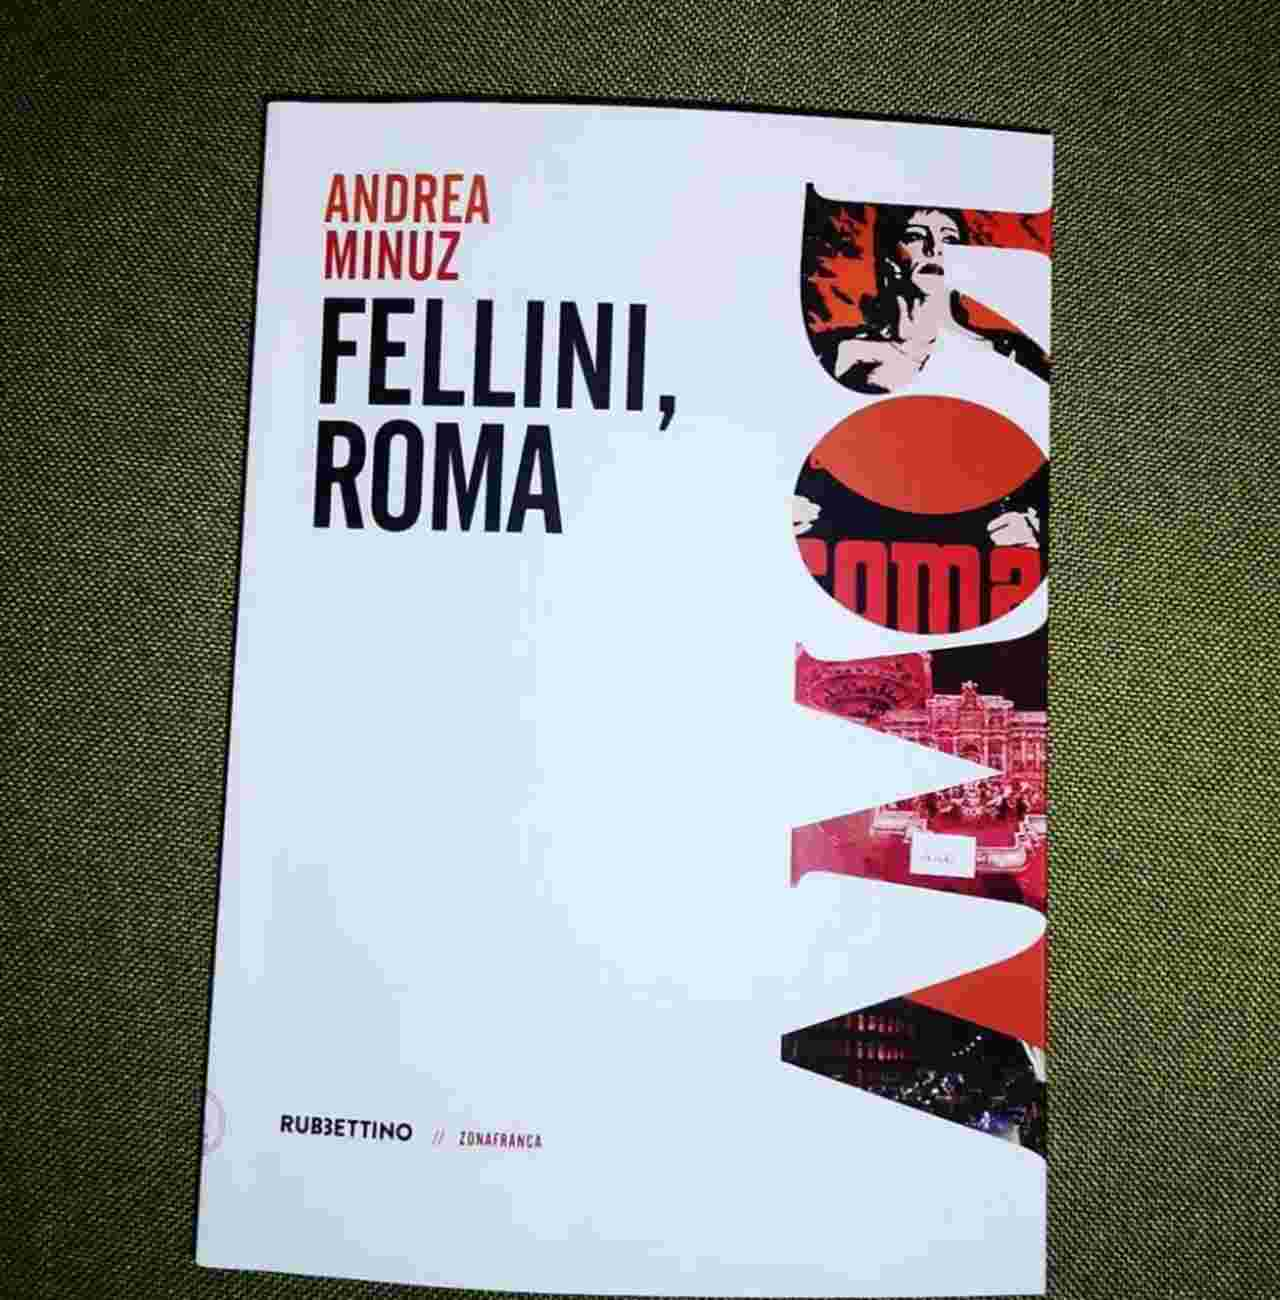 Fellini, Roma